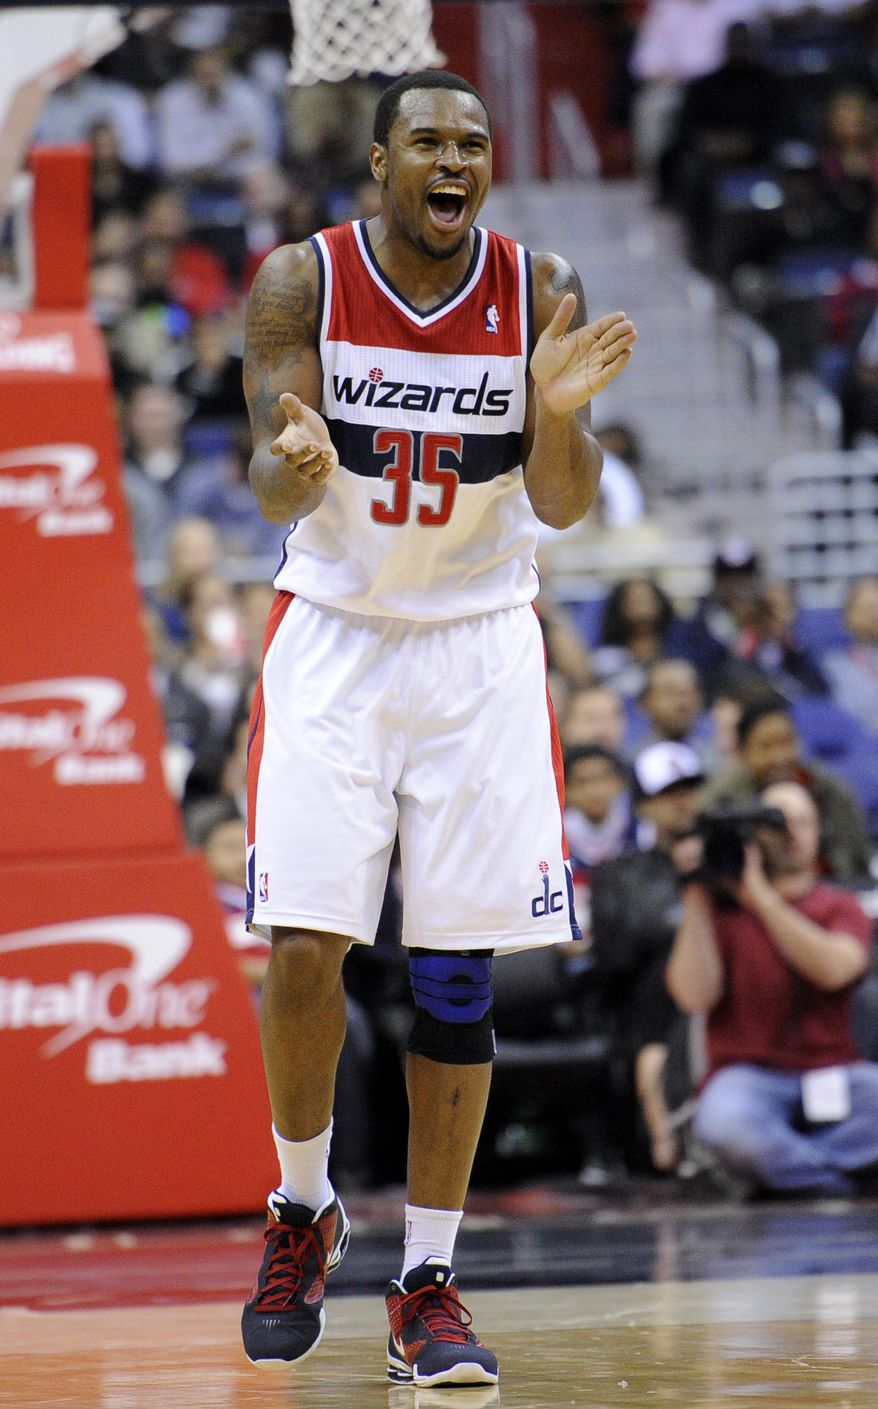 Washington Wizards forward Trevor Booker has been battling a strained left hamstring. (AP Photo/Nick Wass)